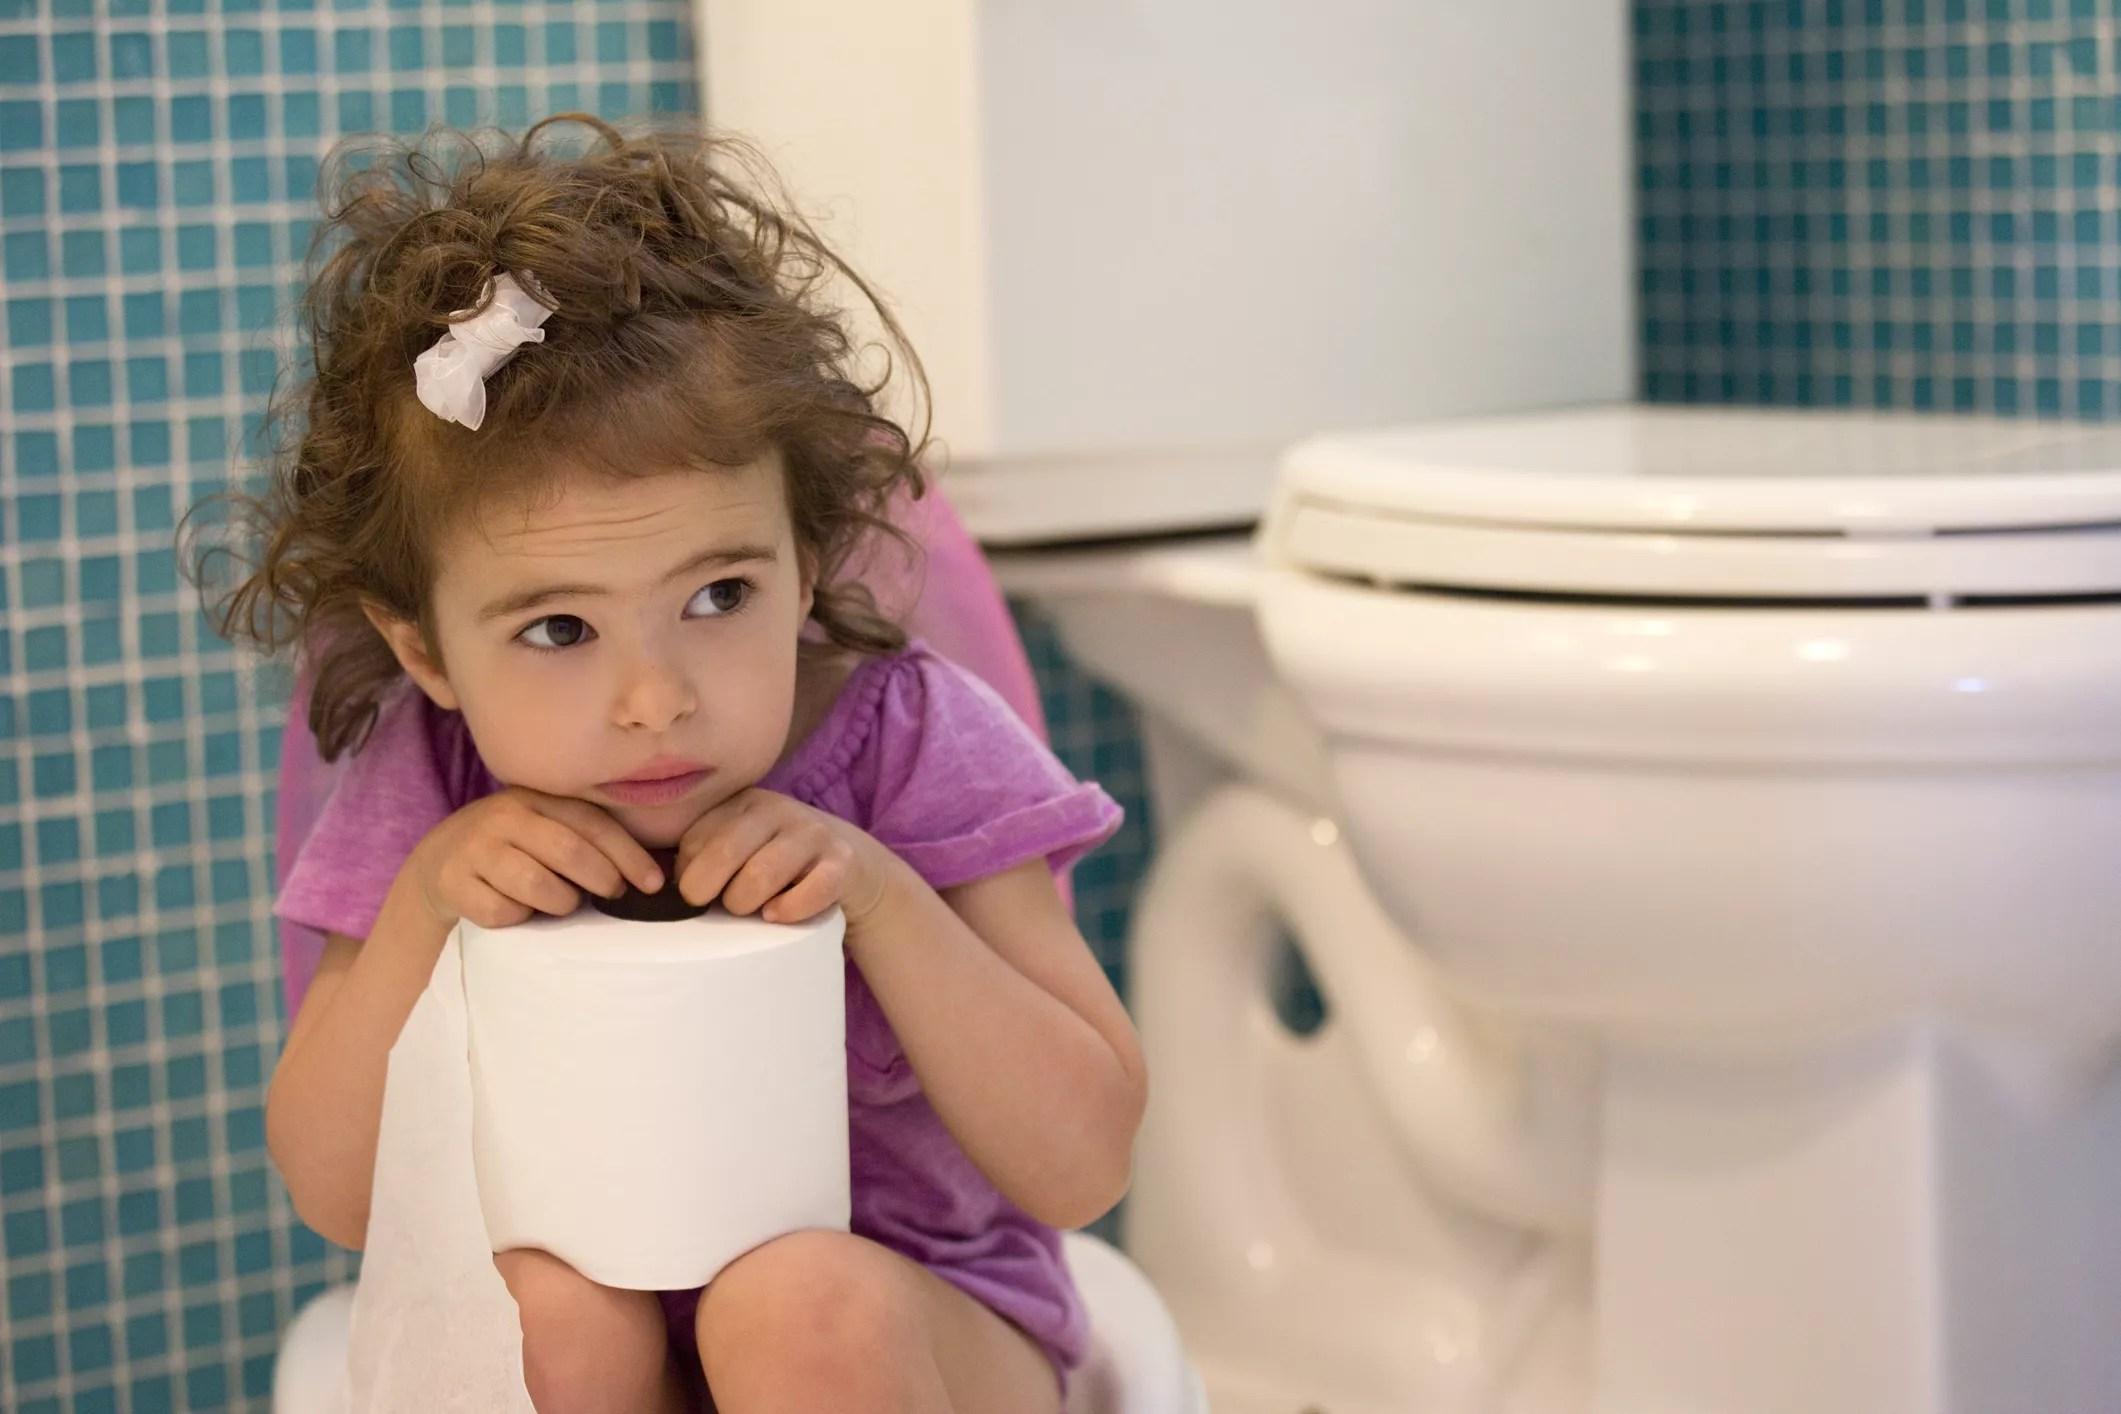 little girl anxious near toilet